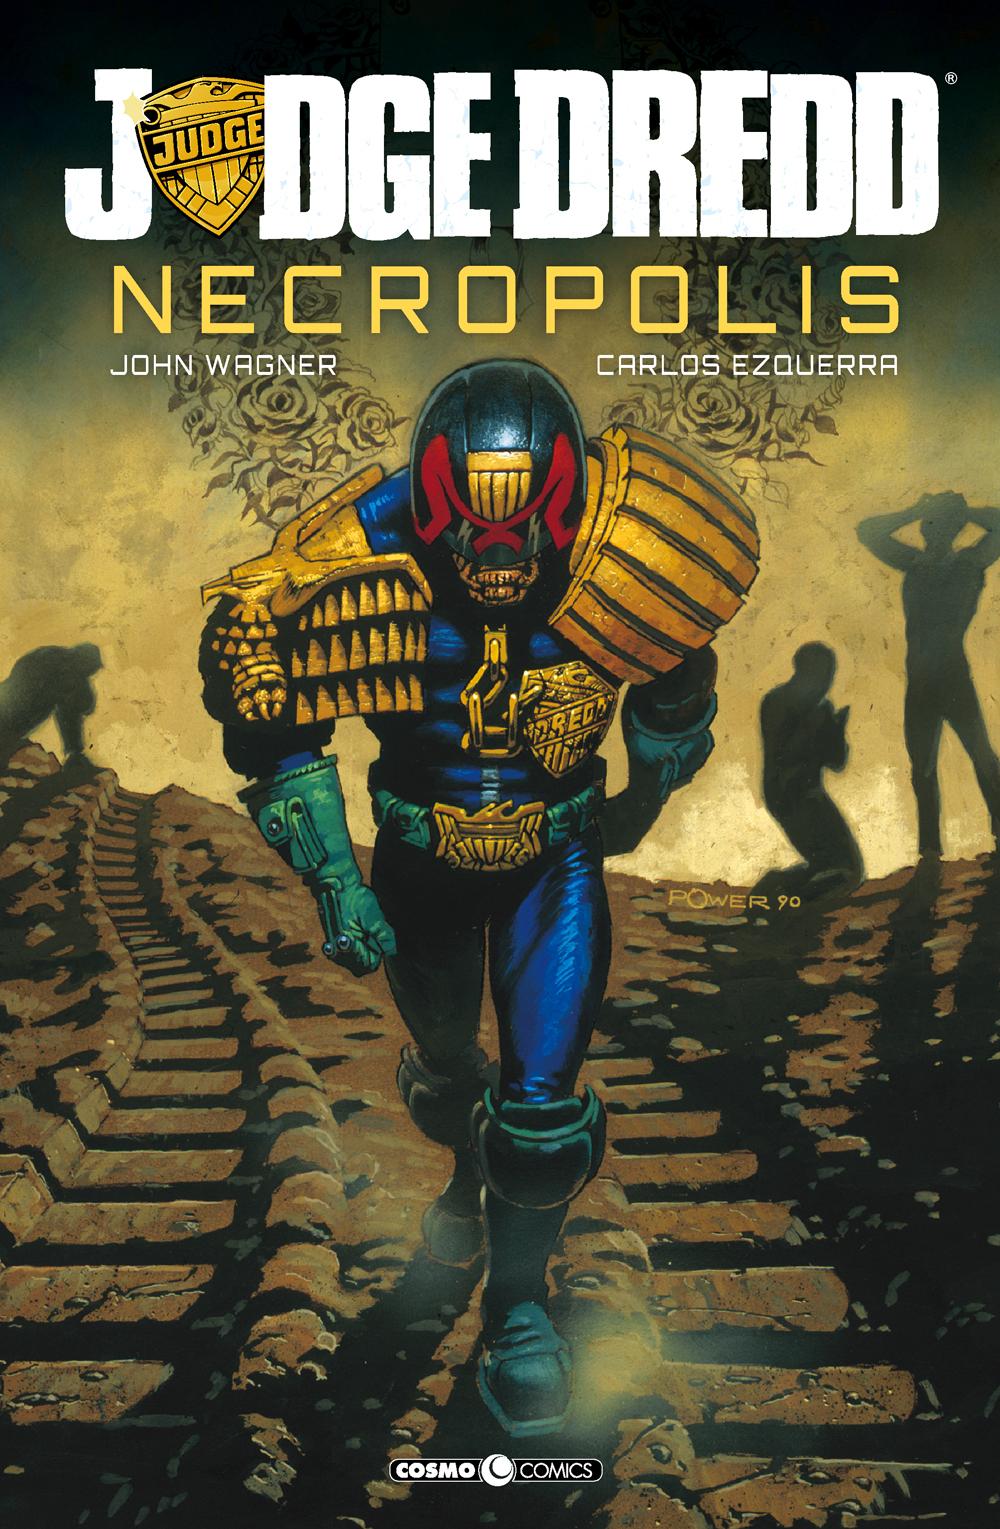 Judge-Dredd-Necropolis-1-cover.jpg